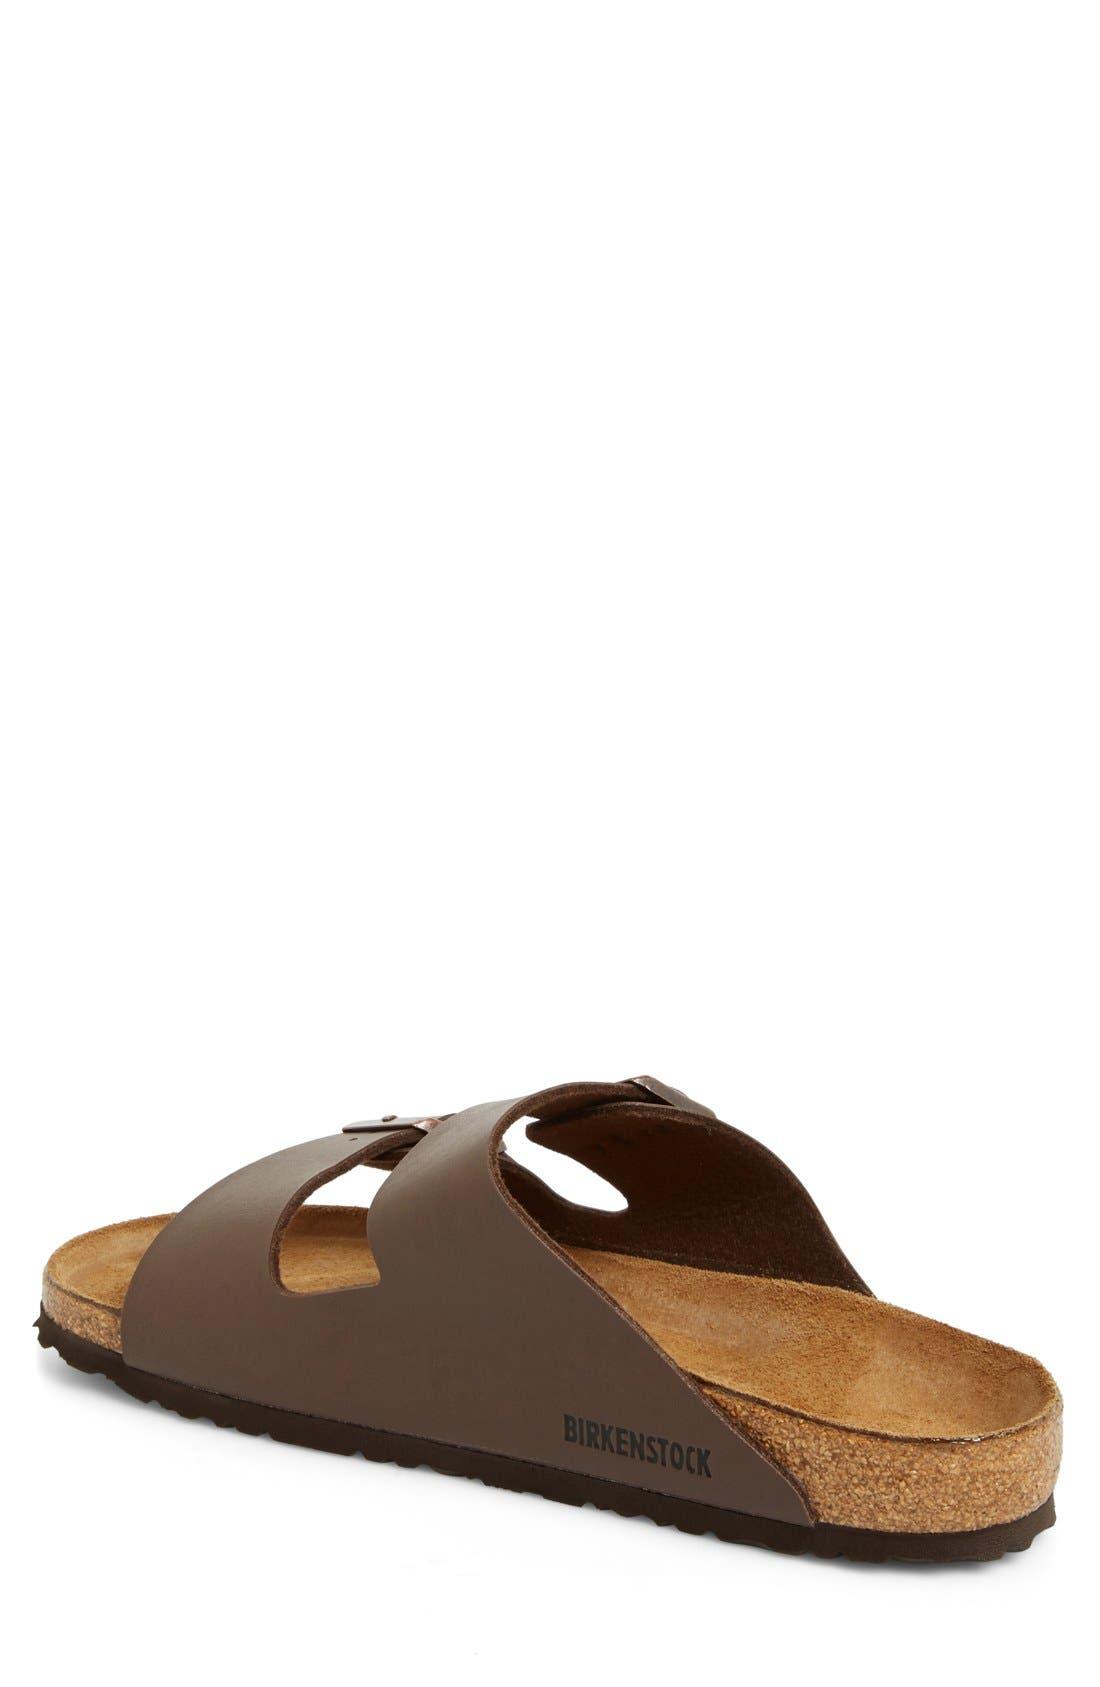 'Arizona' Slide Sandal,                             Alternate thumbnail 2, color,                             Dark Brown